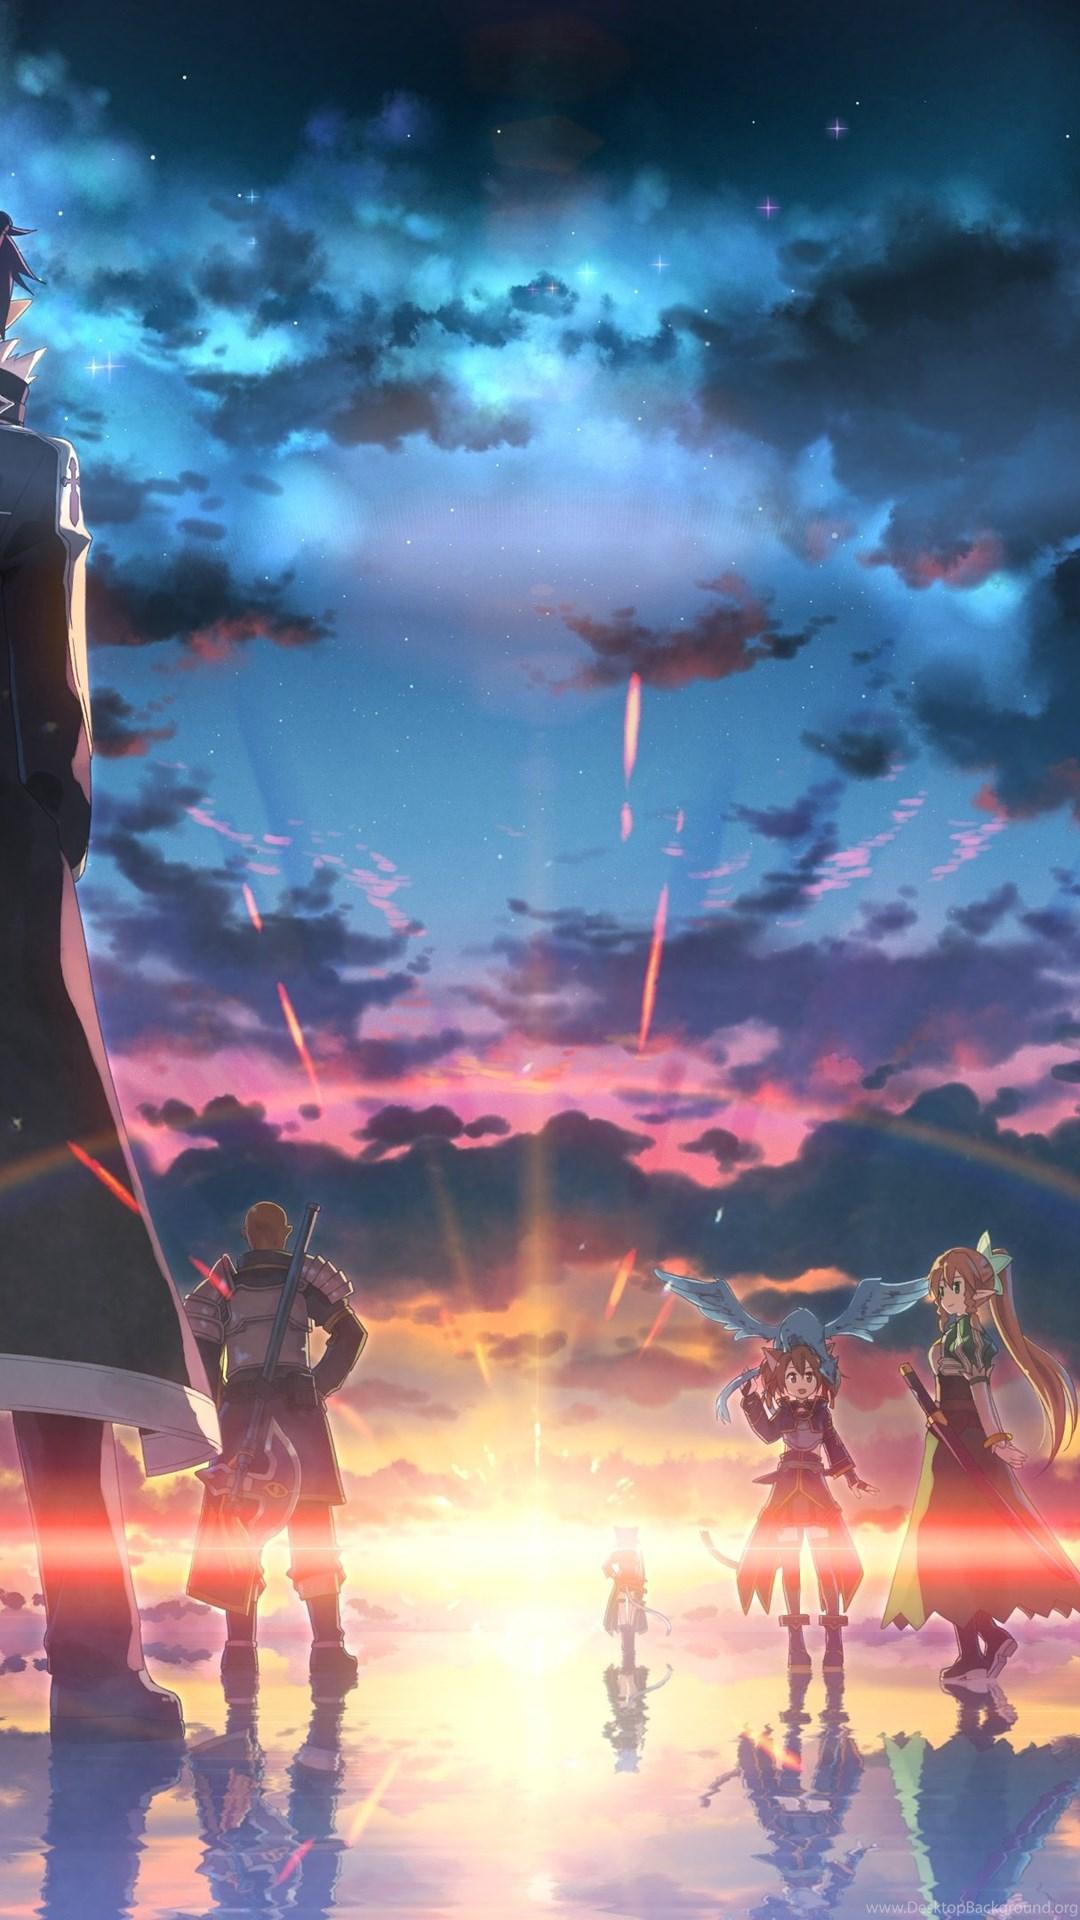 Free download sword art online sao computer wallpapers - Anime background wallpaper 4k ...